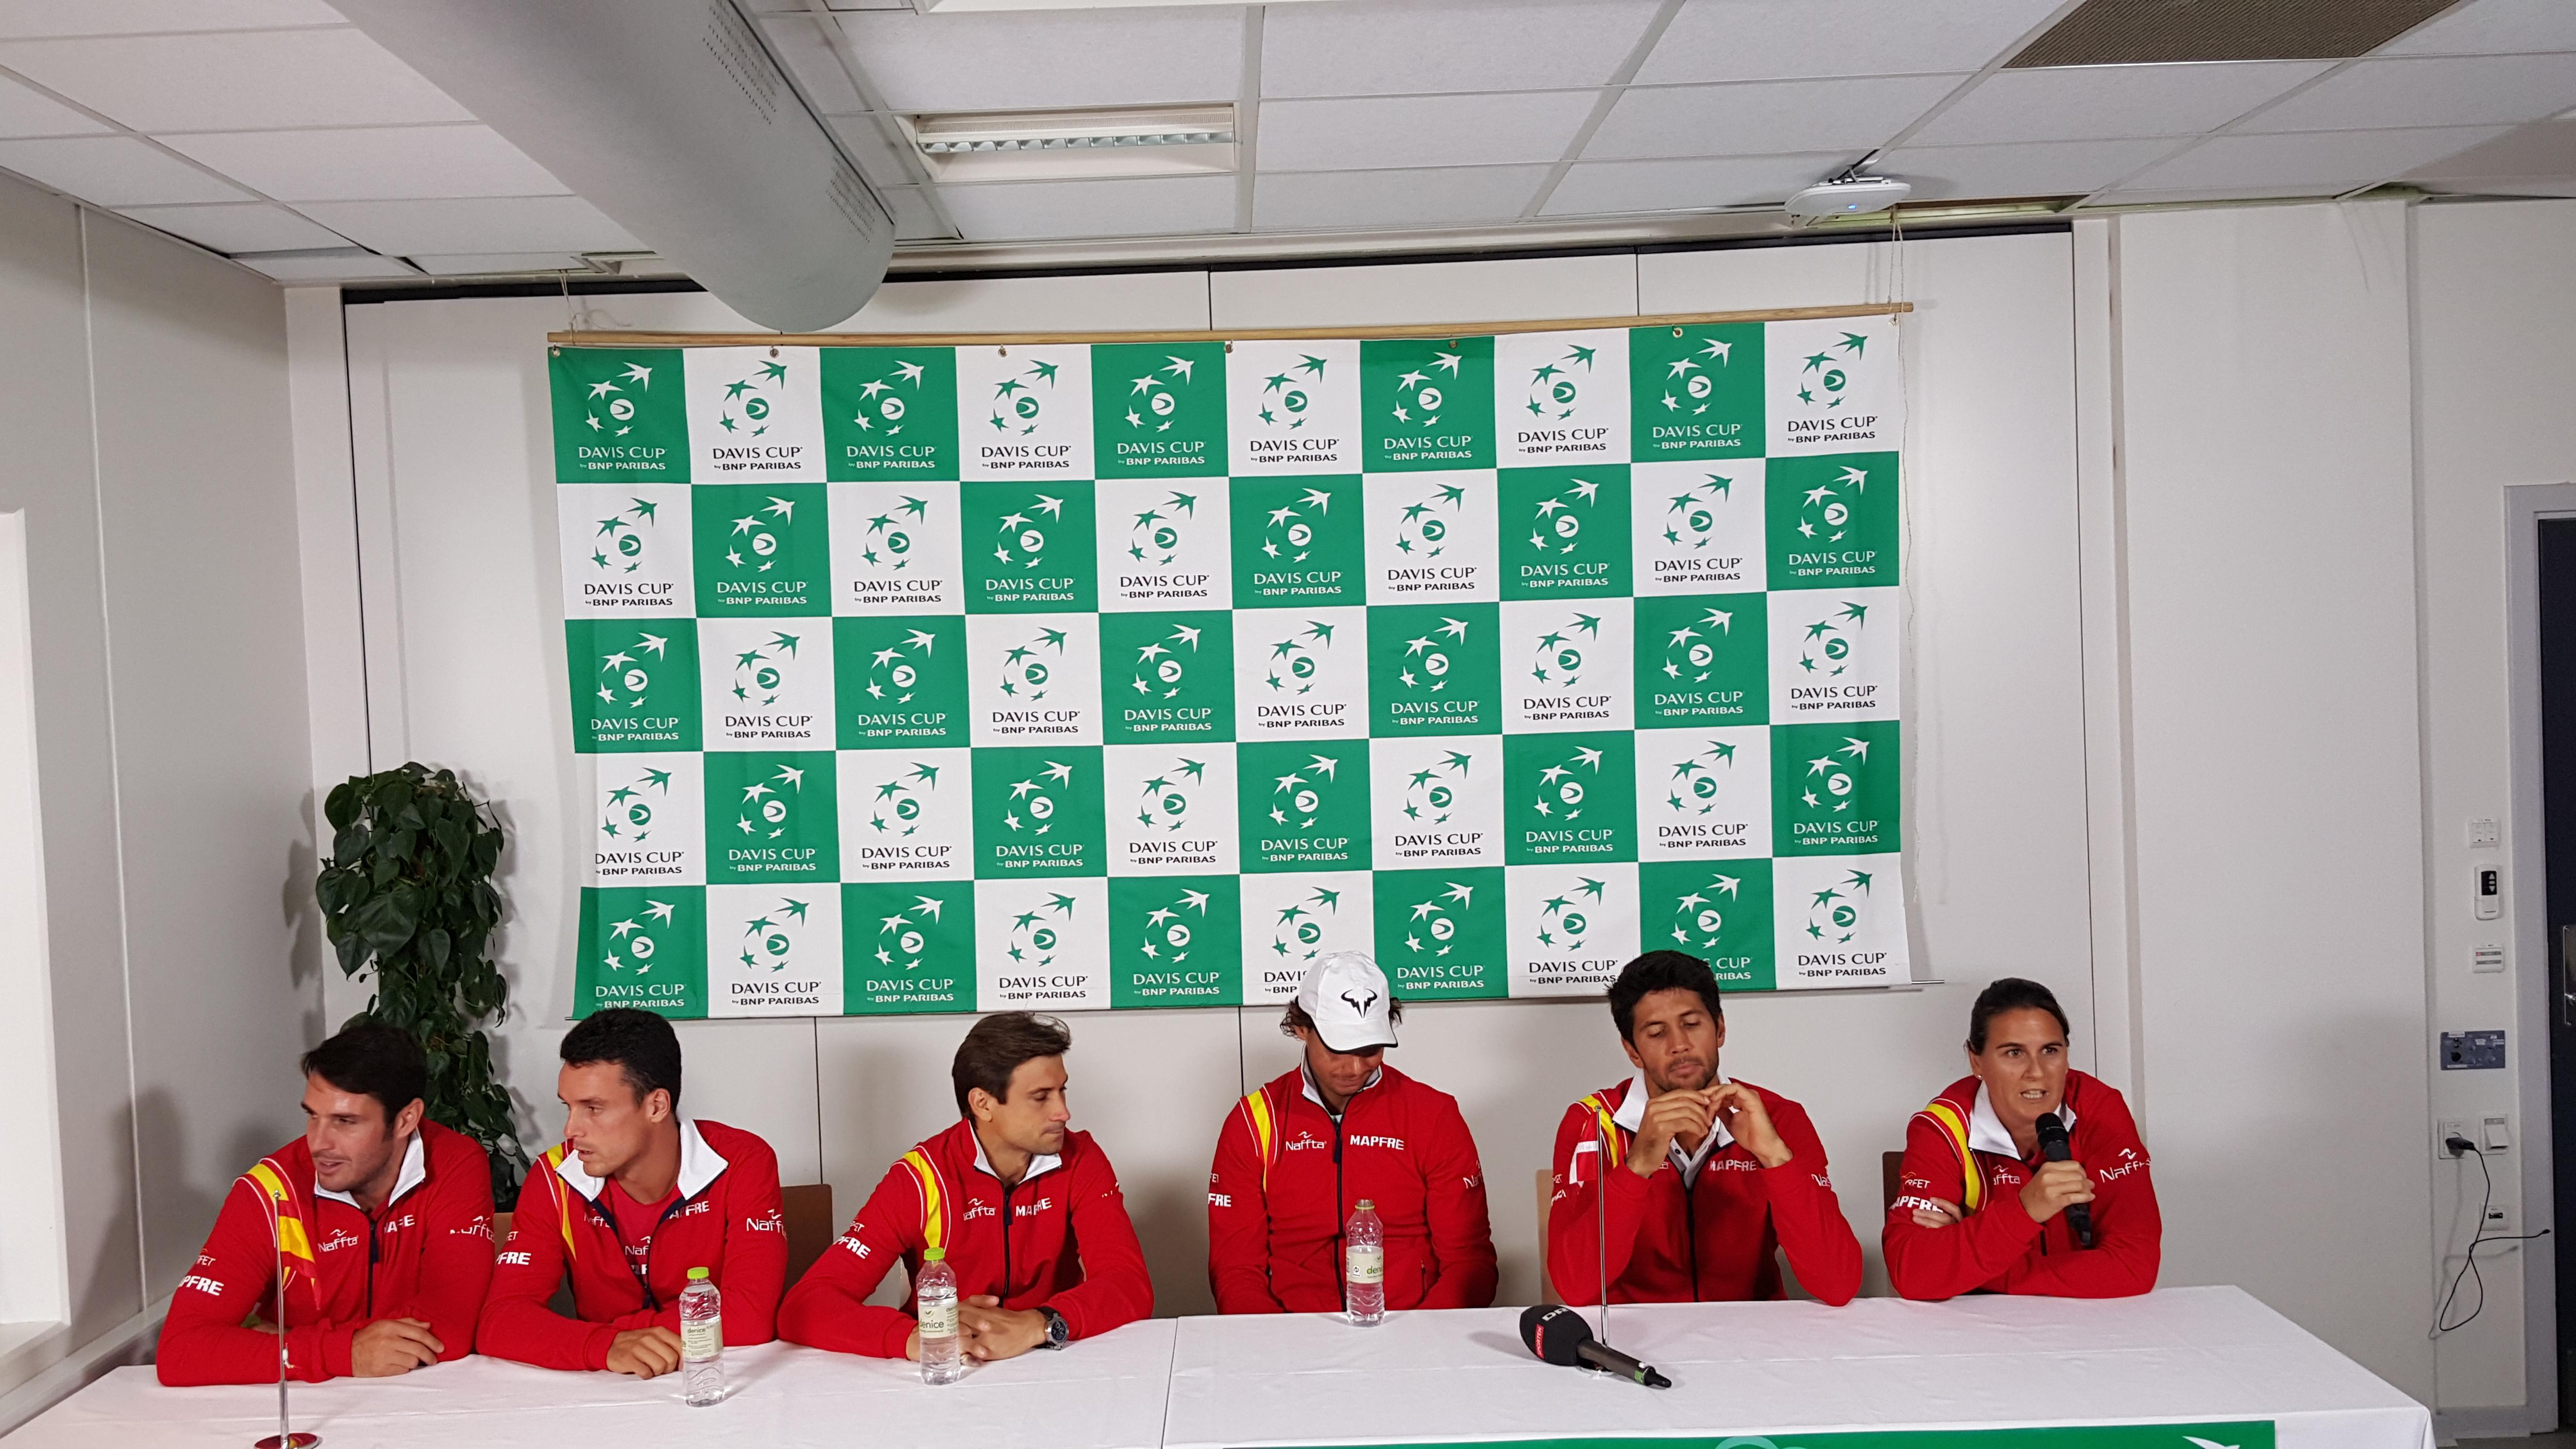 Spaniens Davis Cup hold